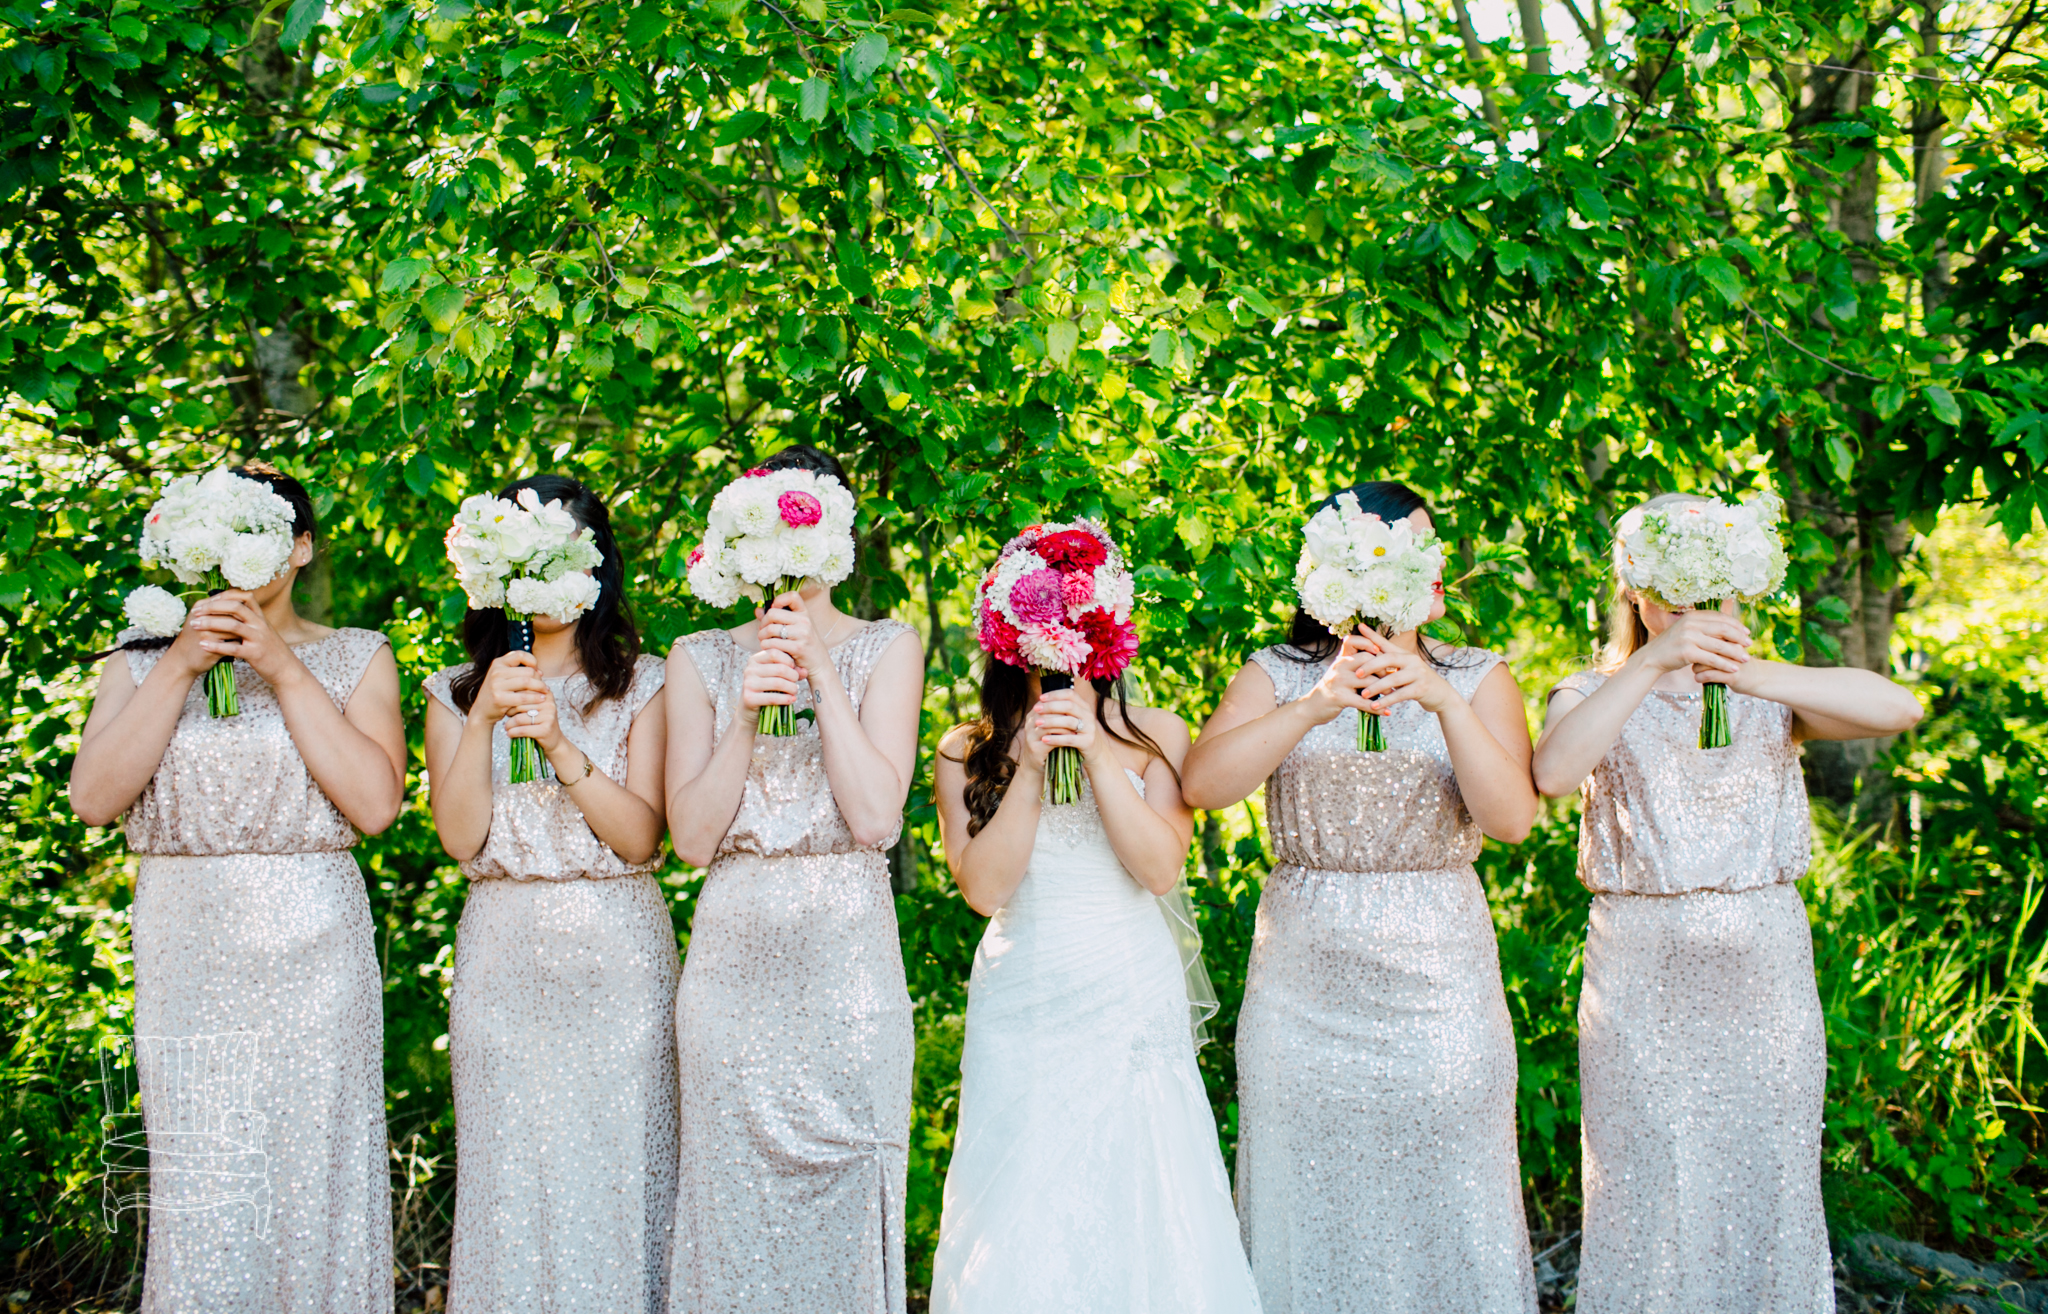 bellingham-washington-wedding-photographer-baker-creek-place-mollee-9.jpg